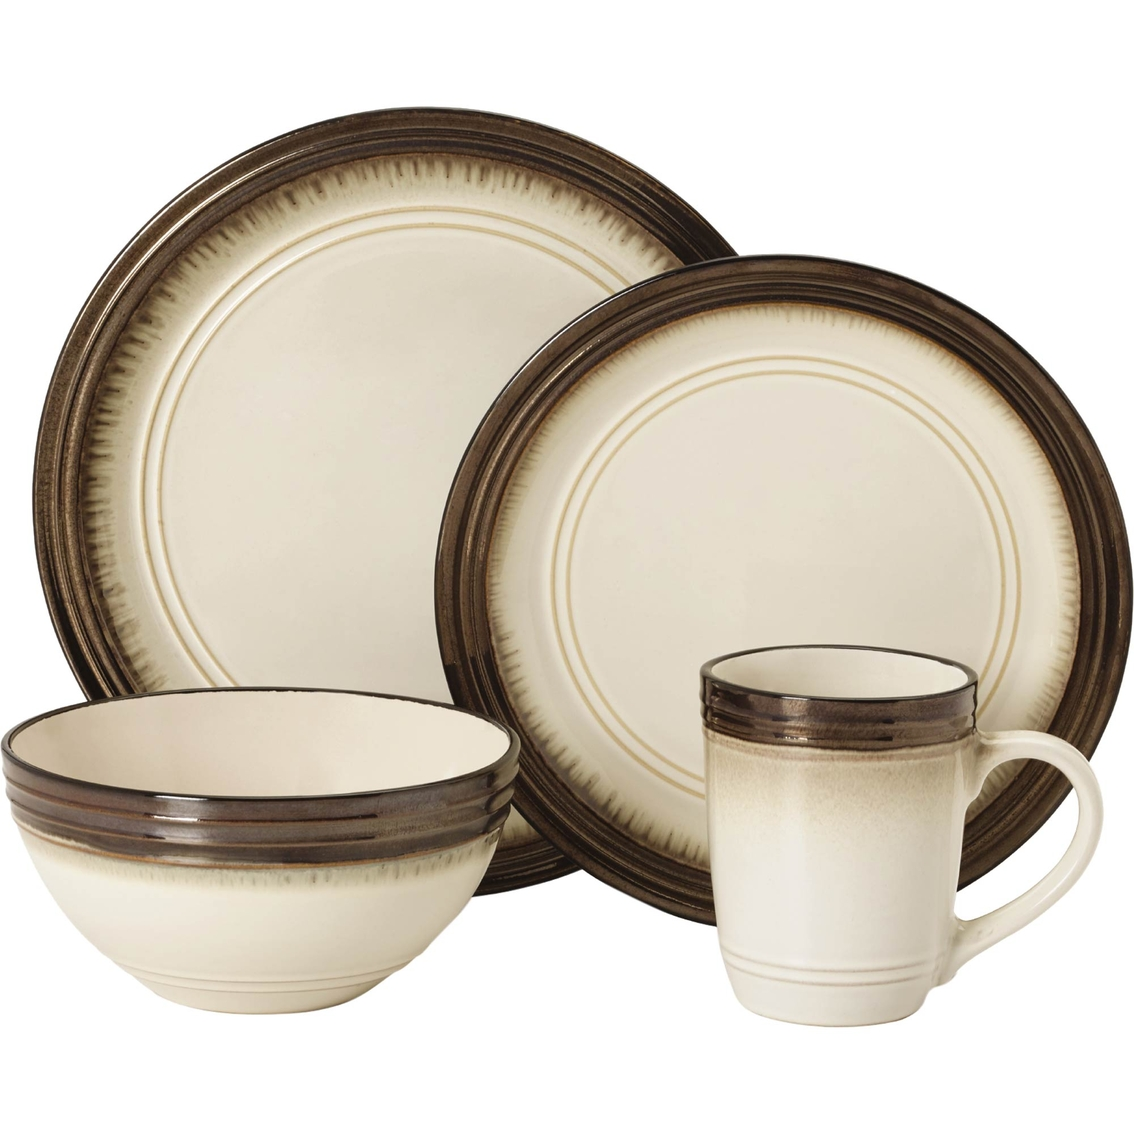 3116  sc 1 st  ShopMyExchange.com & Mikasa Bailey 16 Pc. Dinnerware Set | Dinnerware Sets | Home ...